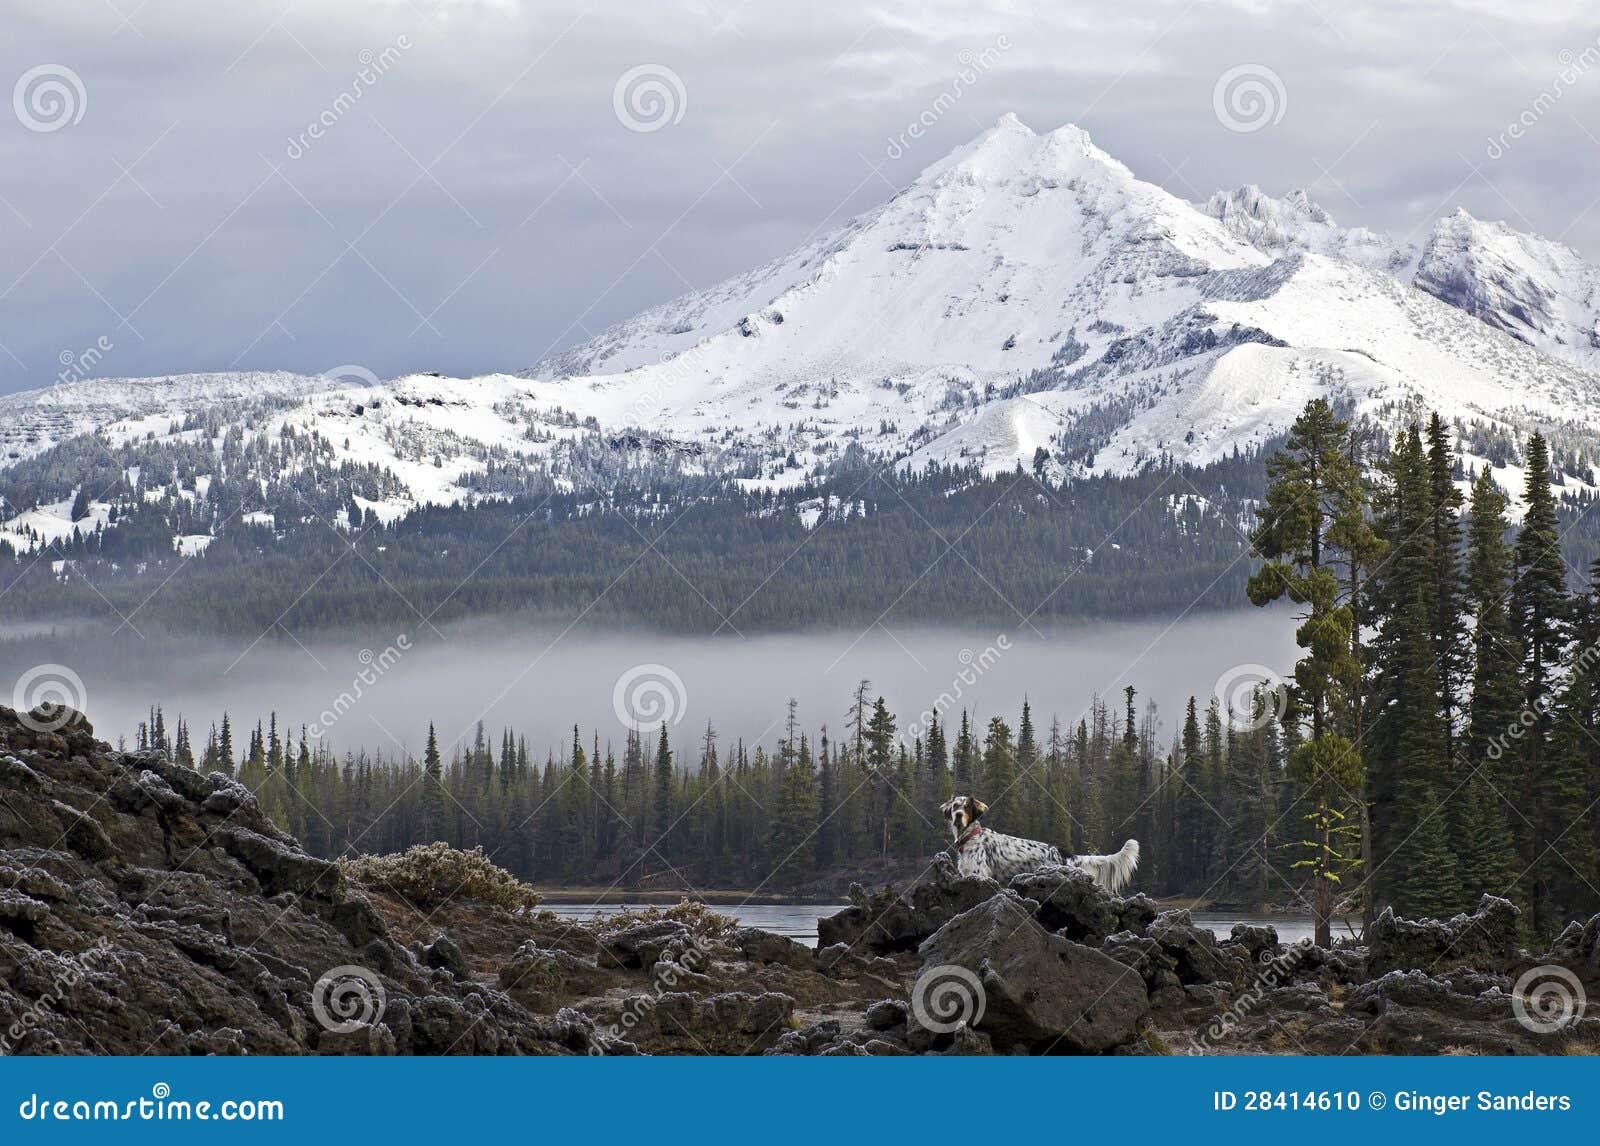 Bird Dog In Mountains